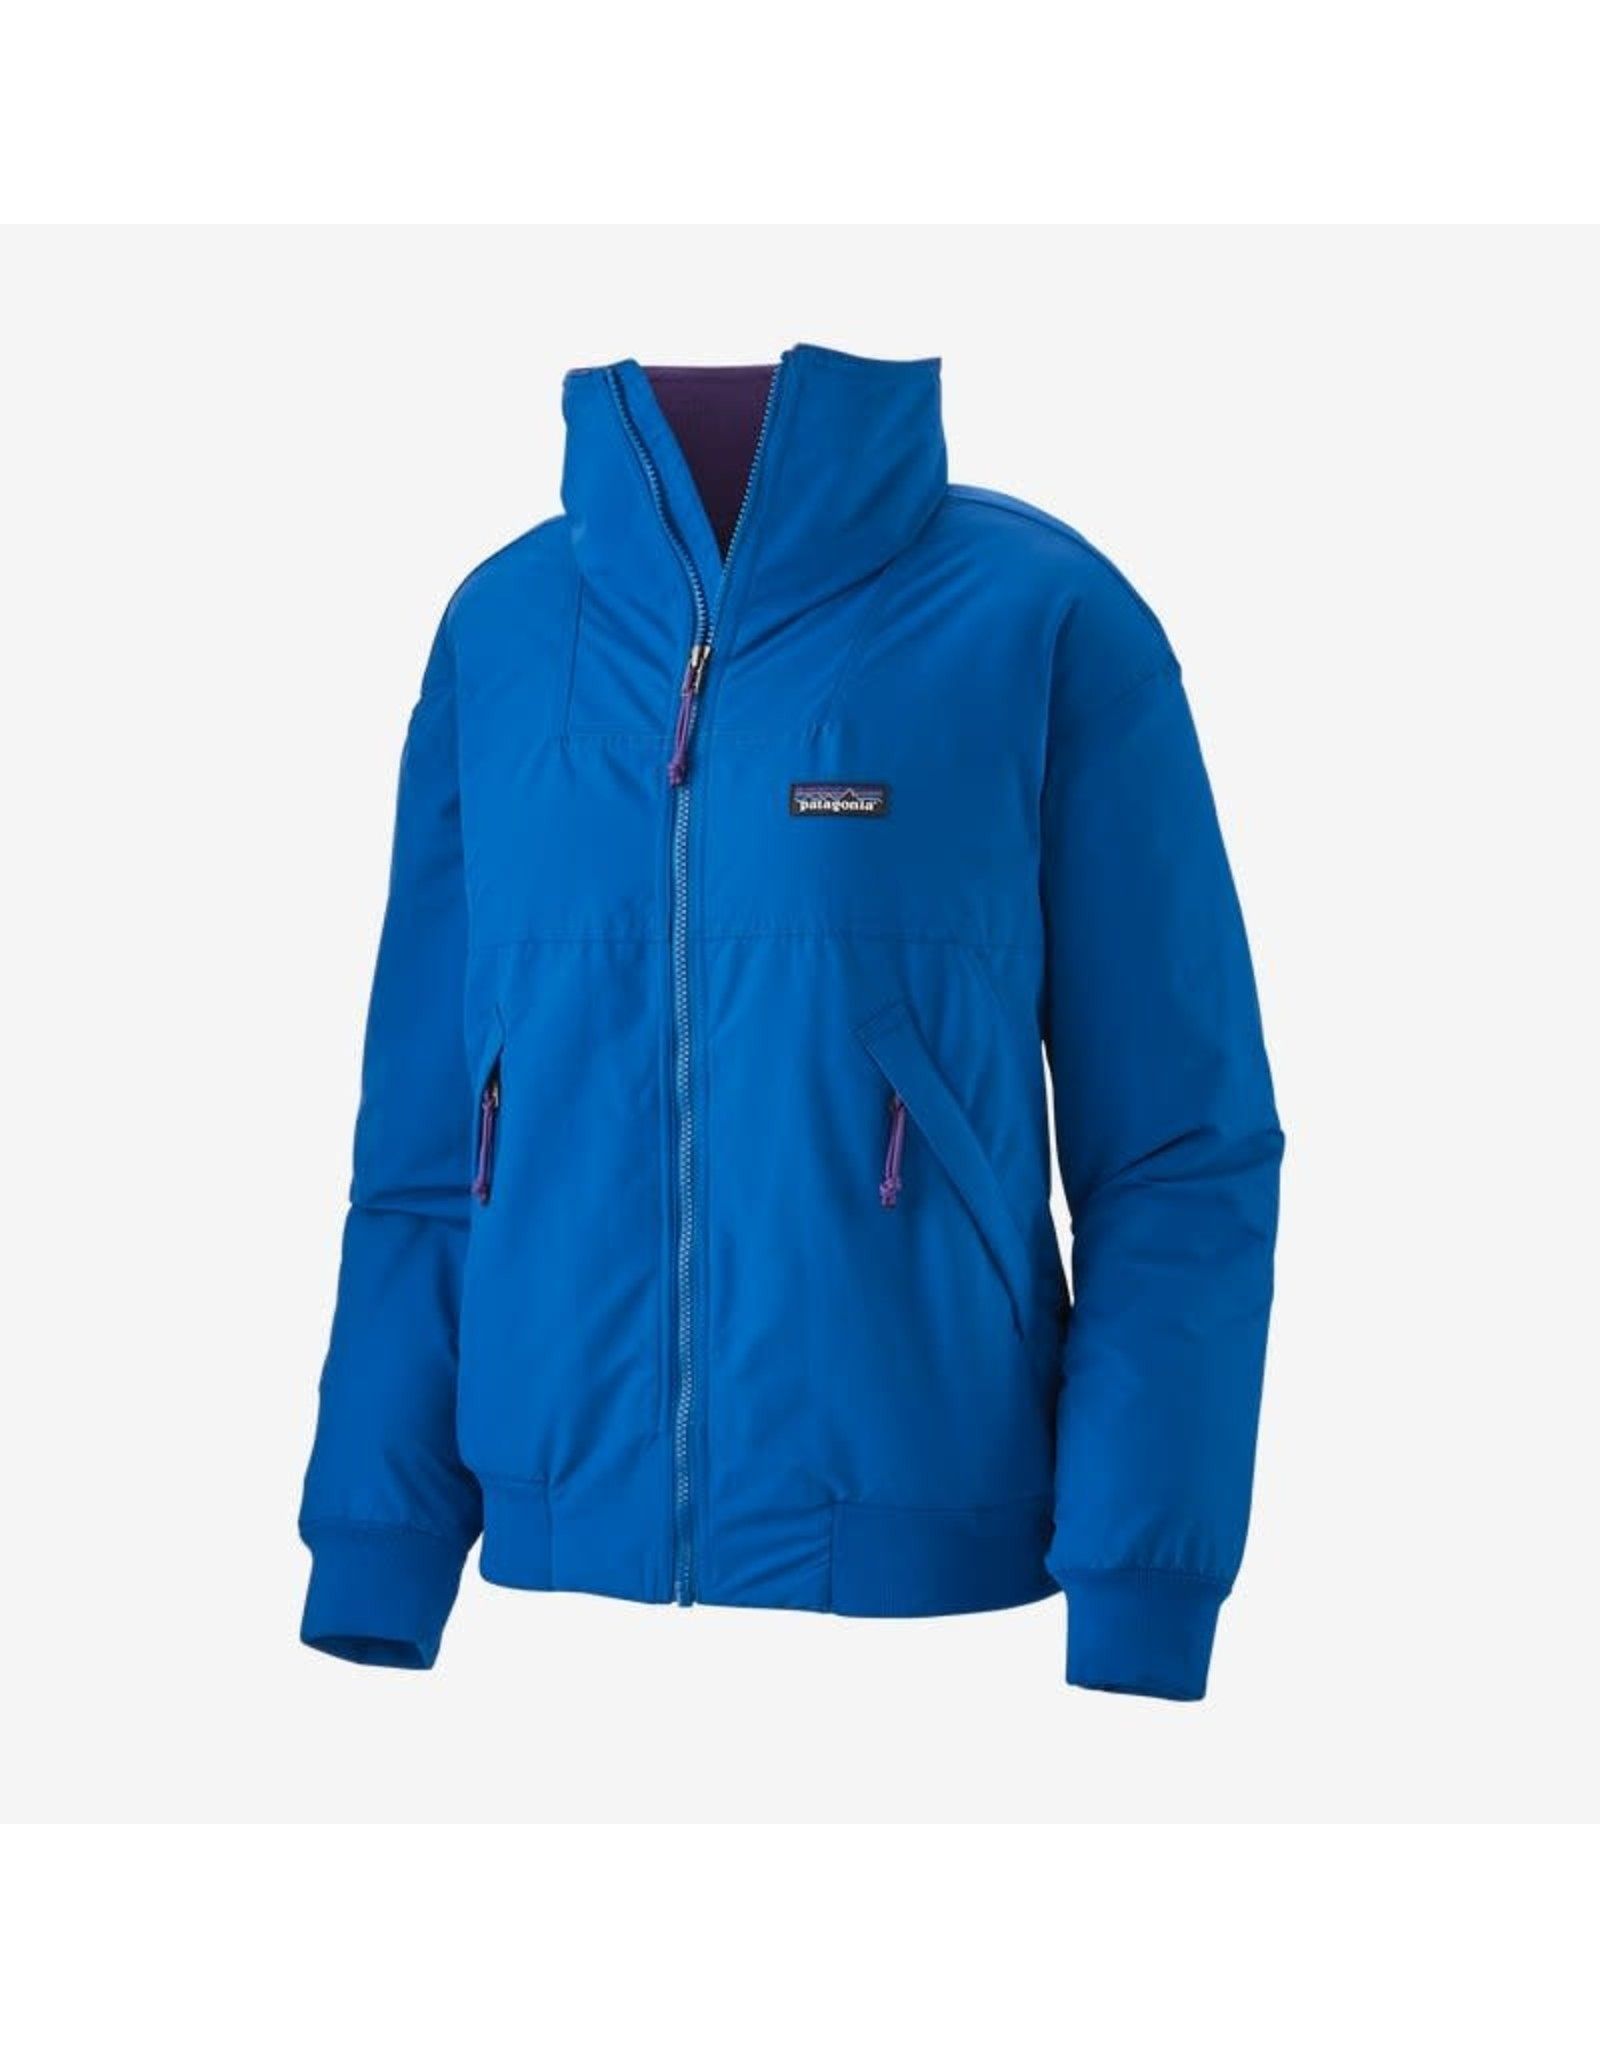 Patagonia Patagonia - Manteau femme shelled synchilla alpine blue